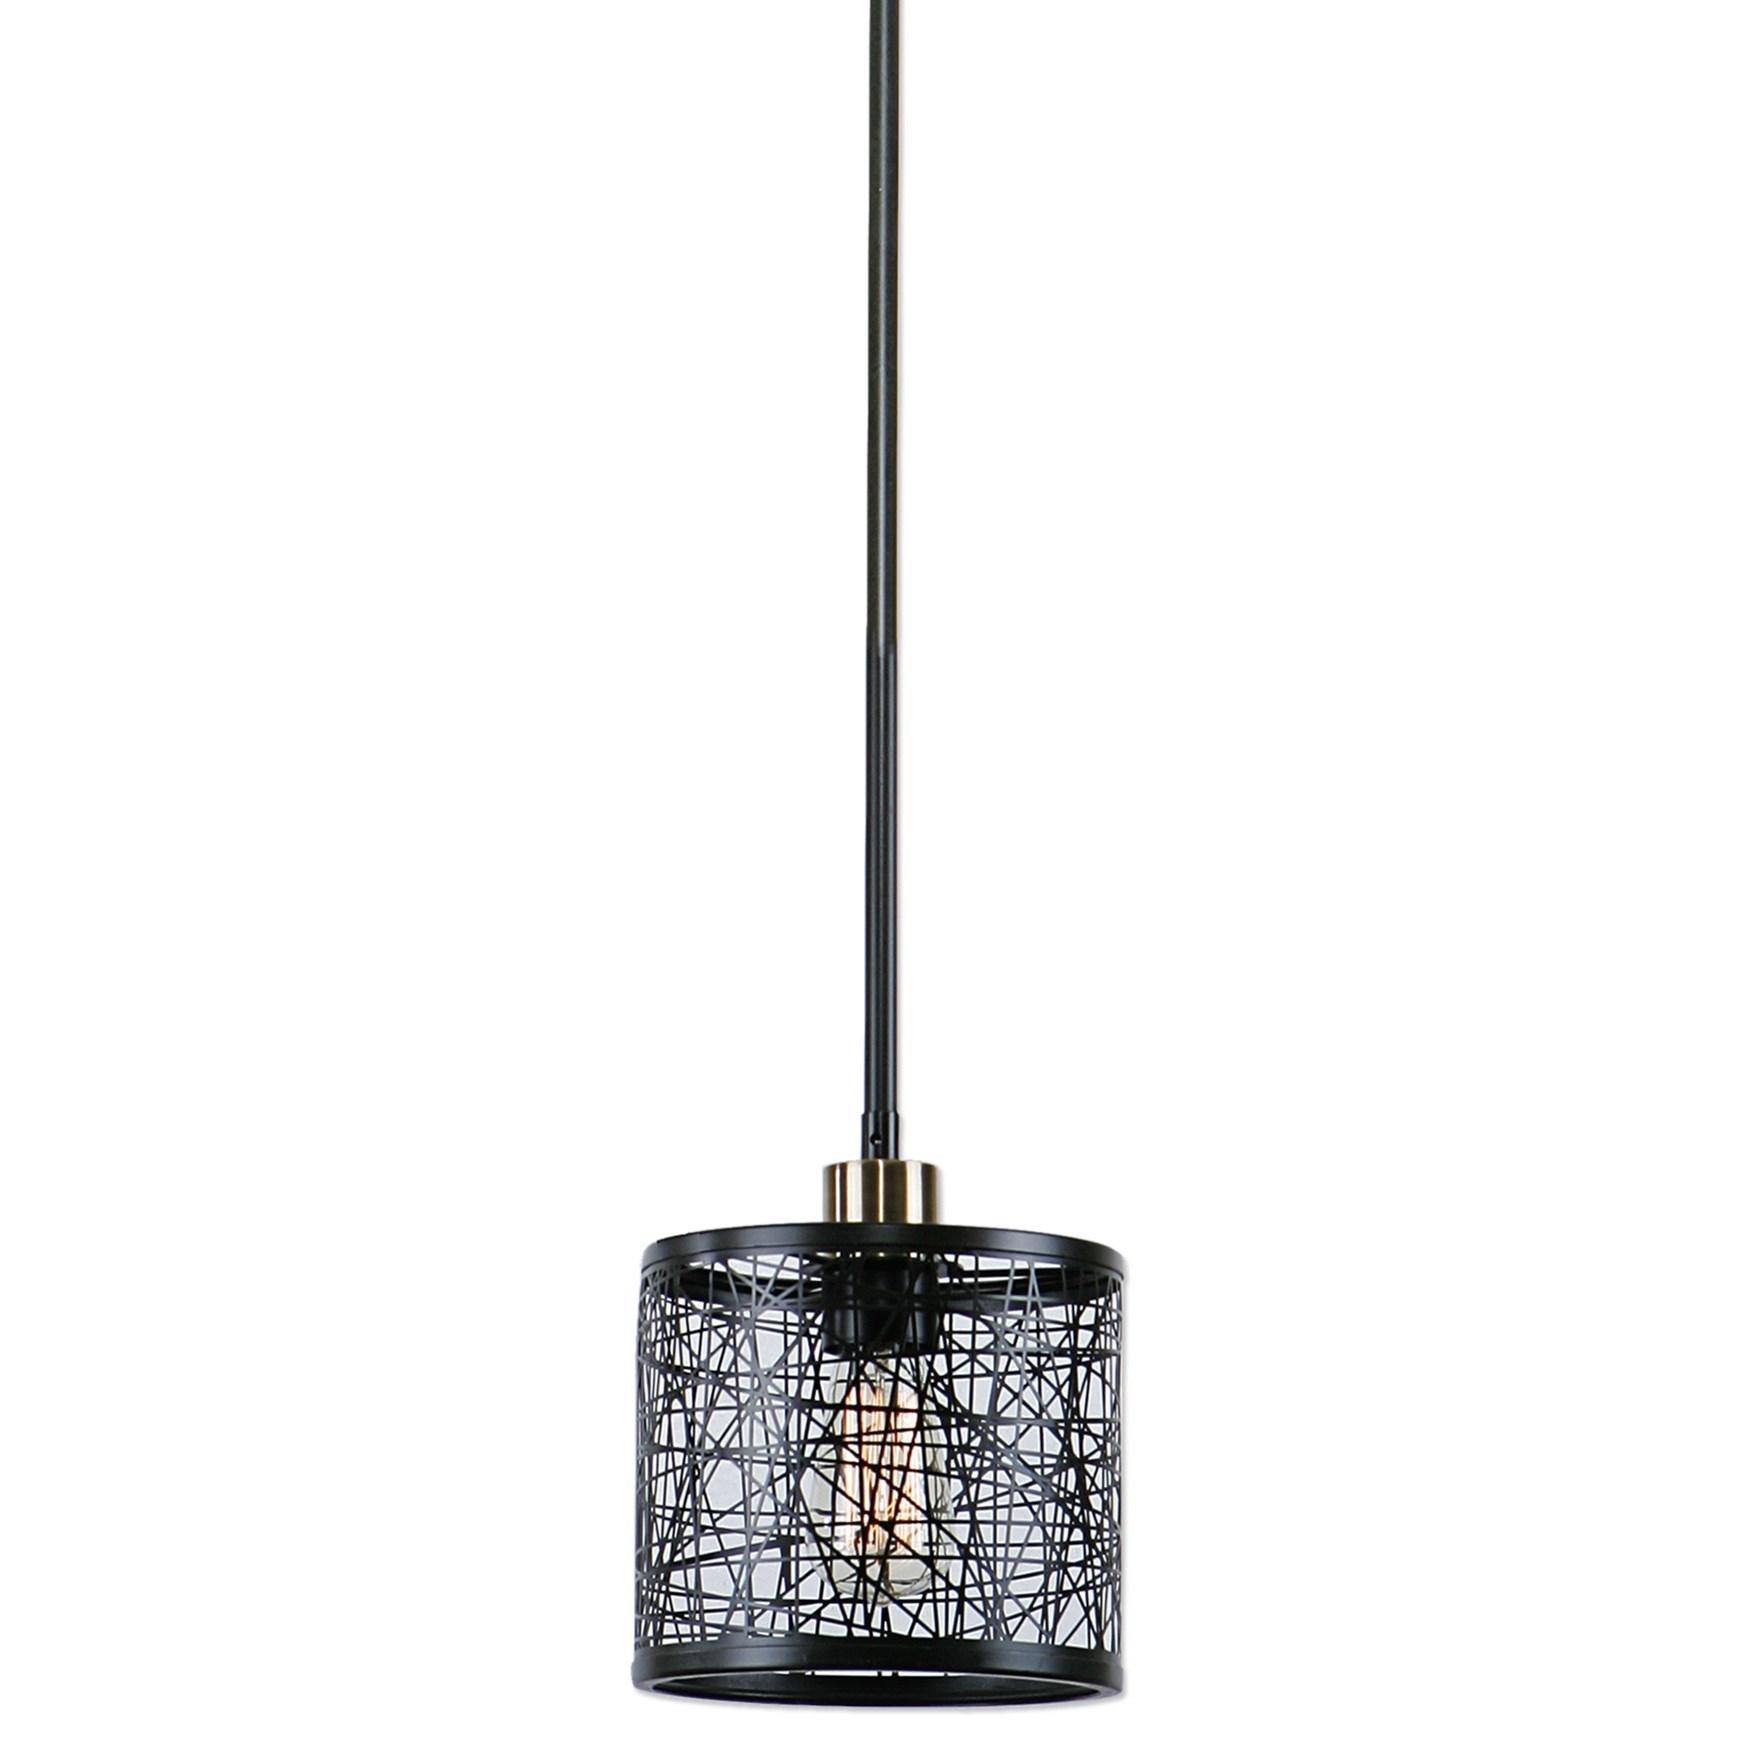 Uttermost Lighting Fixtures ThinAlita 1 Light Bronze Mini Pendant - Item Number: 22083